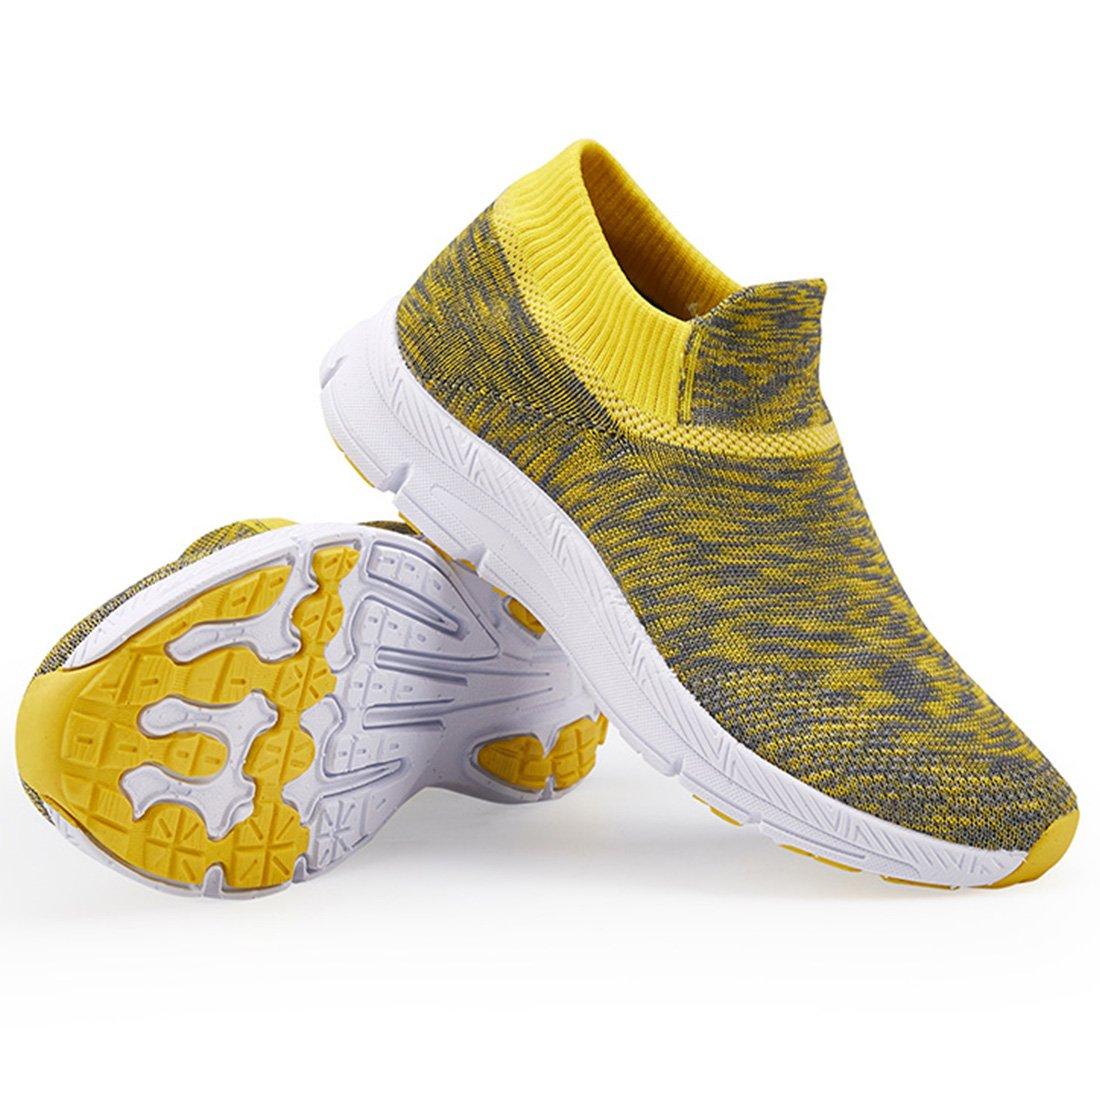 VIFUUR Girls Boys Socks Shoes Fashion Casual Walking Shoes Breathable Lightweight Sneakers Kids Gray/Yellow-33 by VIFUUR